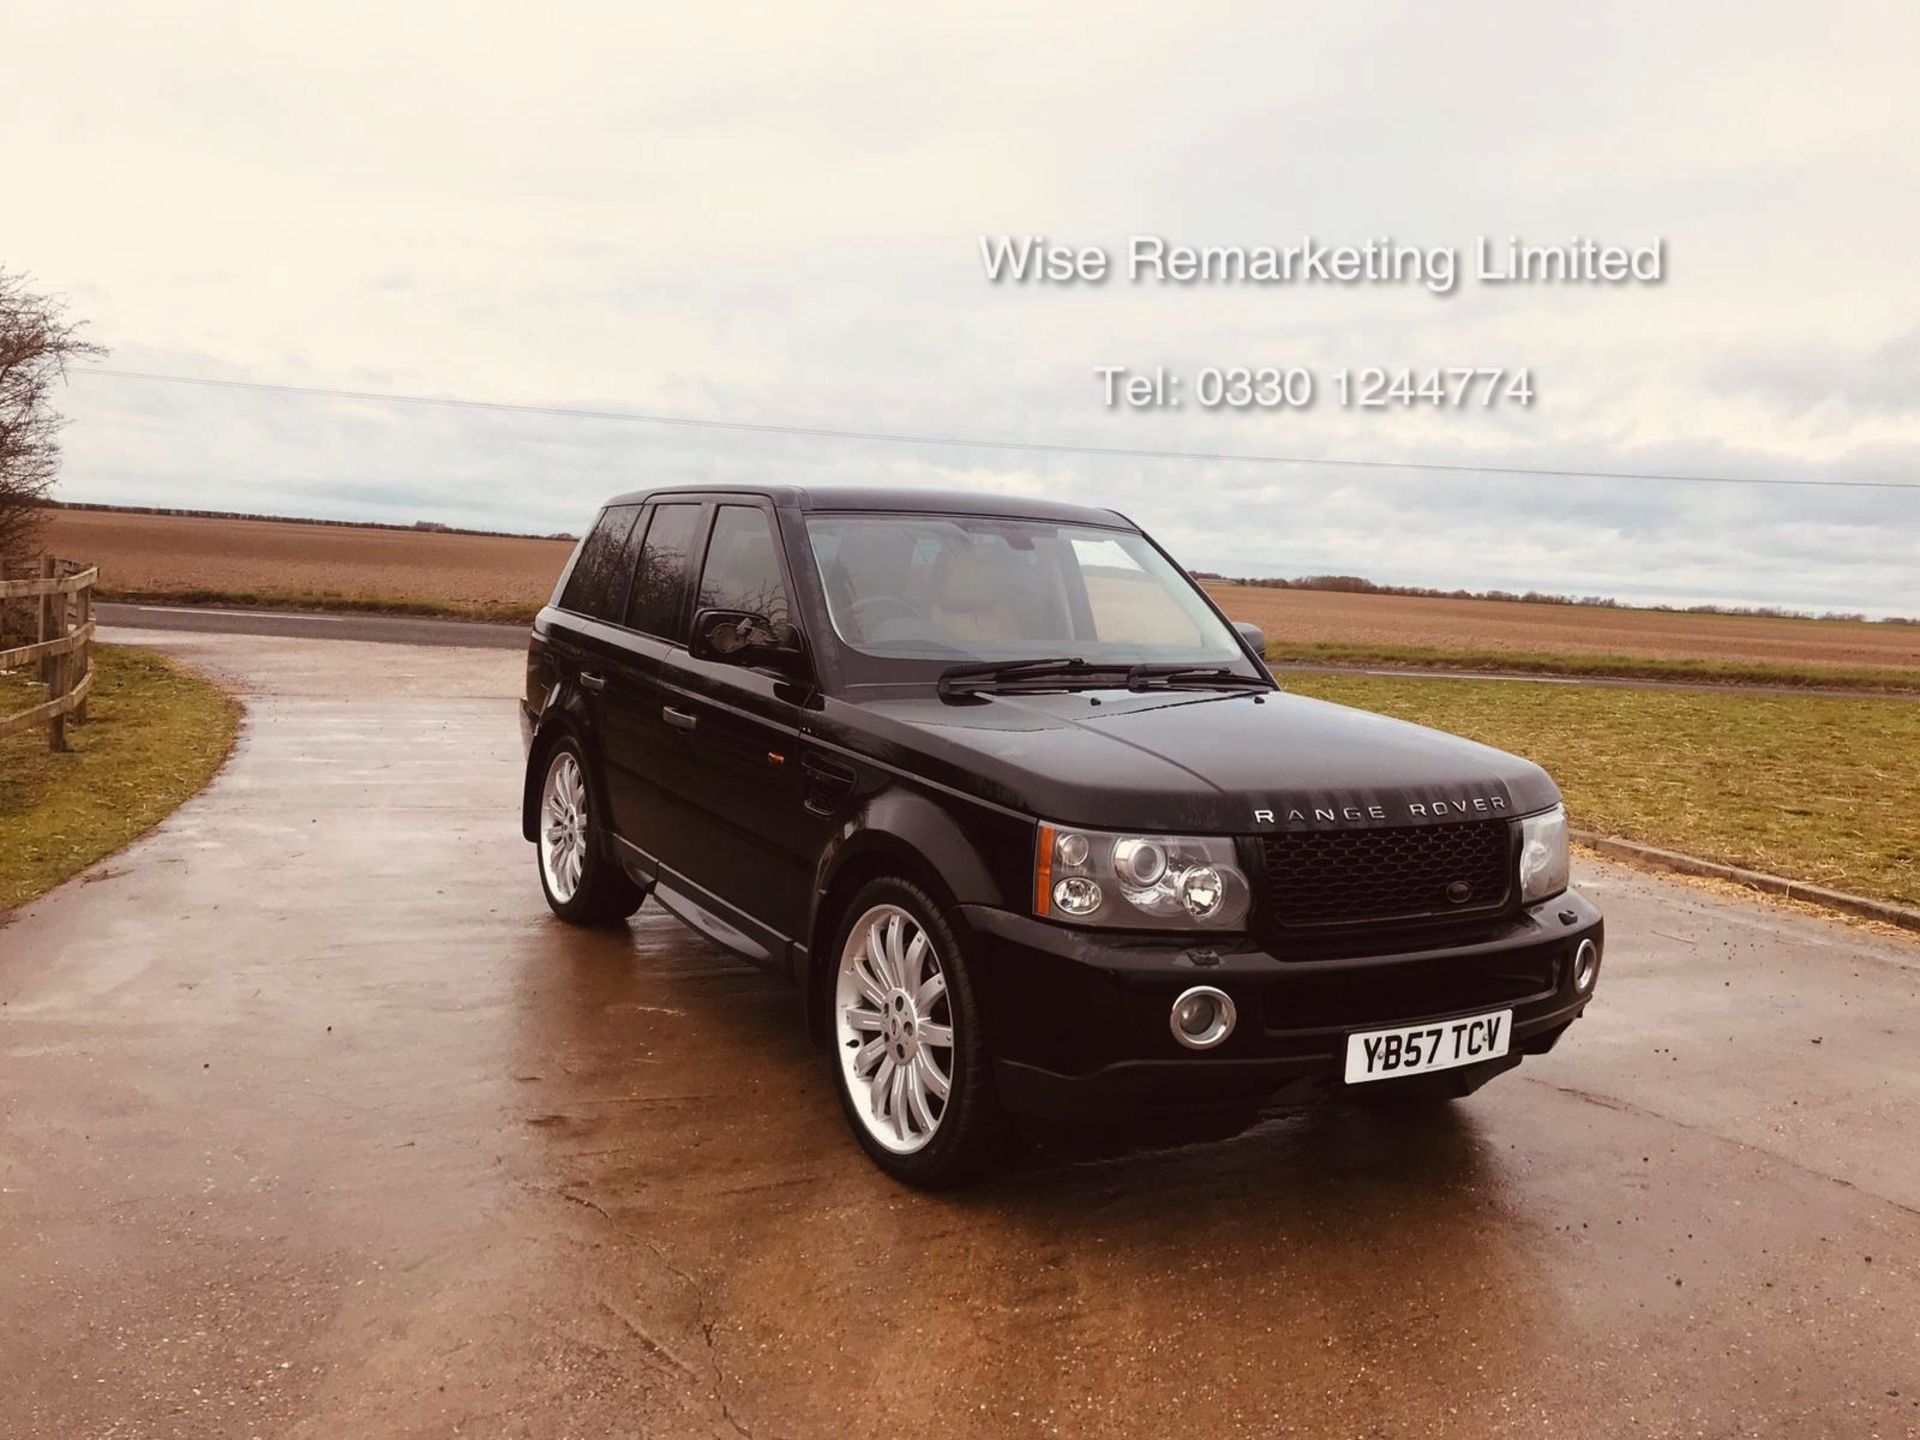 Range Rover Sport 2.7 TDV6 HSE Auto - 2008 Model - Cream Leather - Sat Nav - Heated Seats - Image 4 of 19